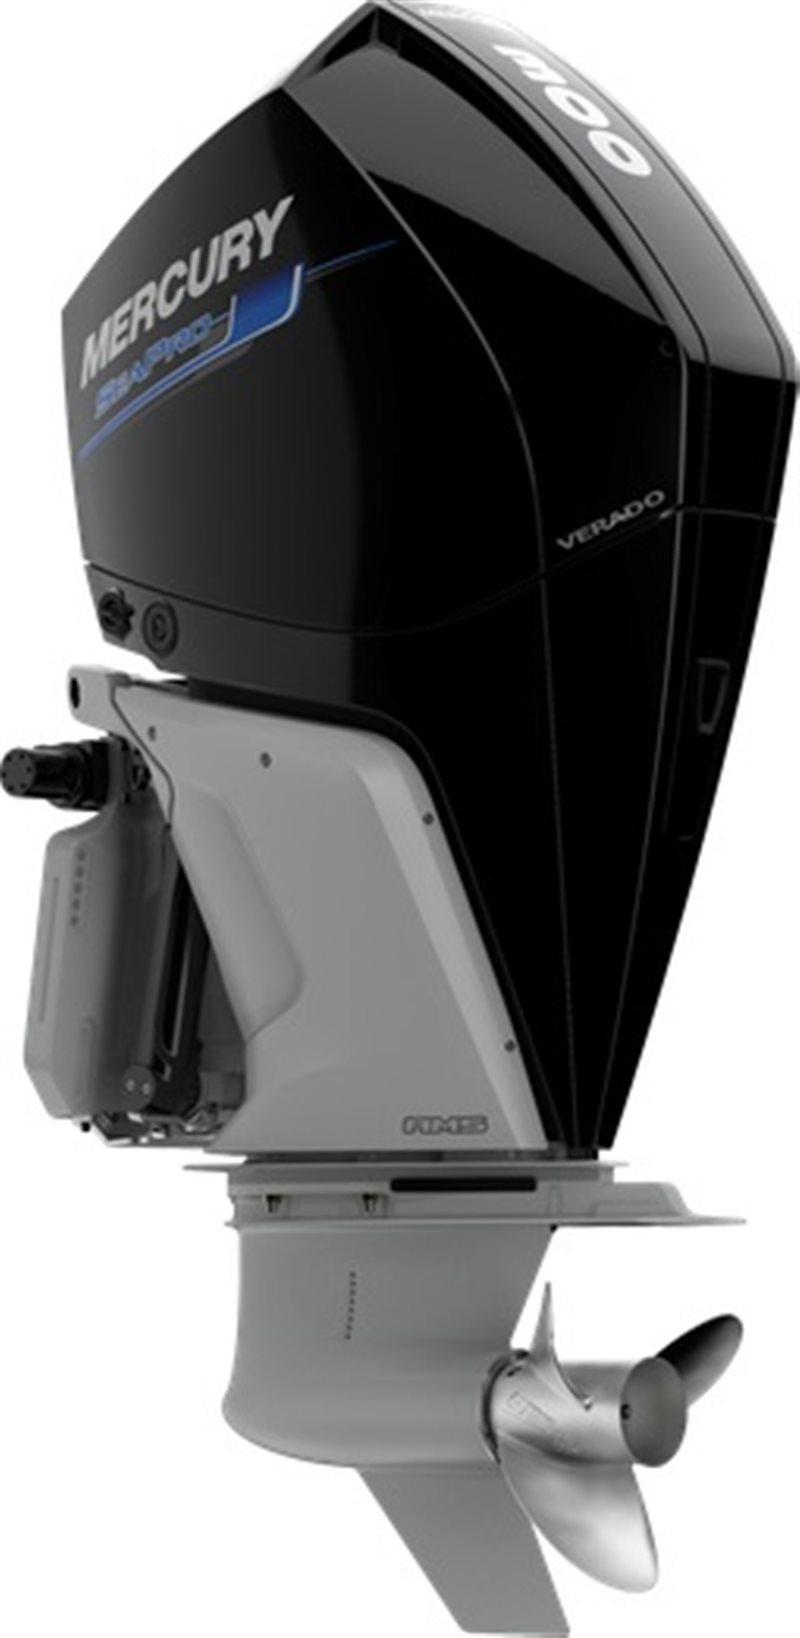 2021 Mercury Outboard SeaPro 200 - 300 SeaPro 300 AMS at Pharo Marine, Waunakee, WI 53597